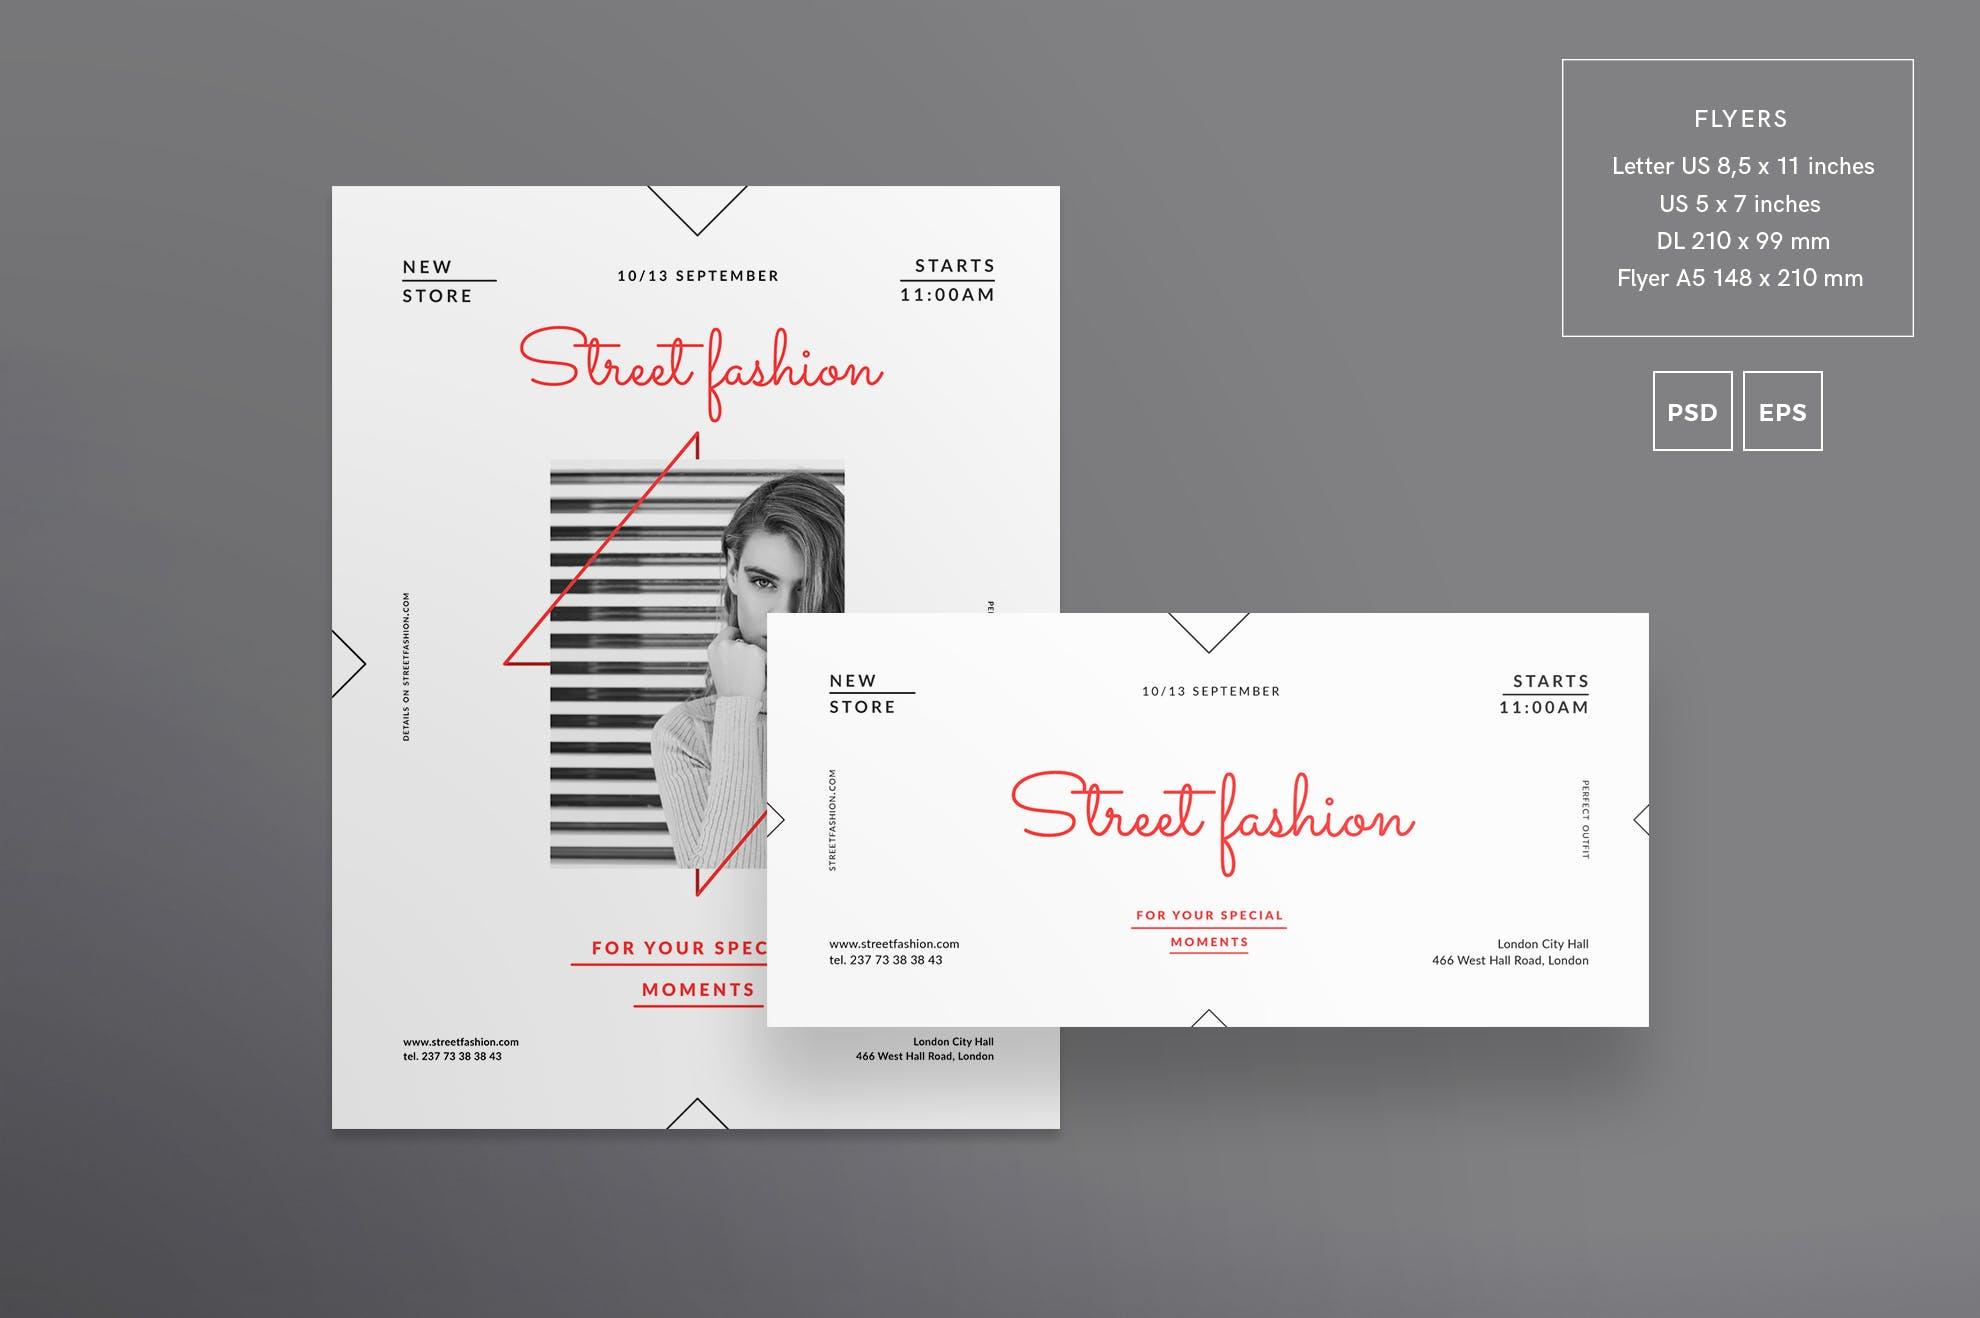 时尚商店服装几何图形传单和海报模板Fashion Store Flyer and Poster Template